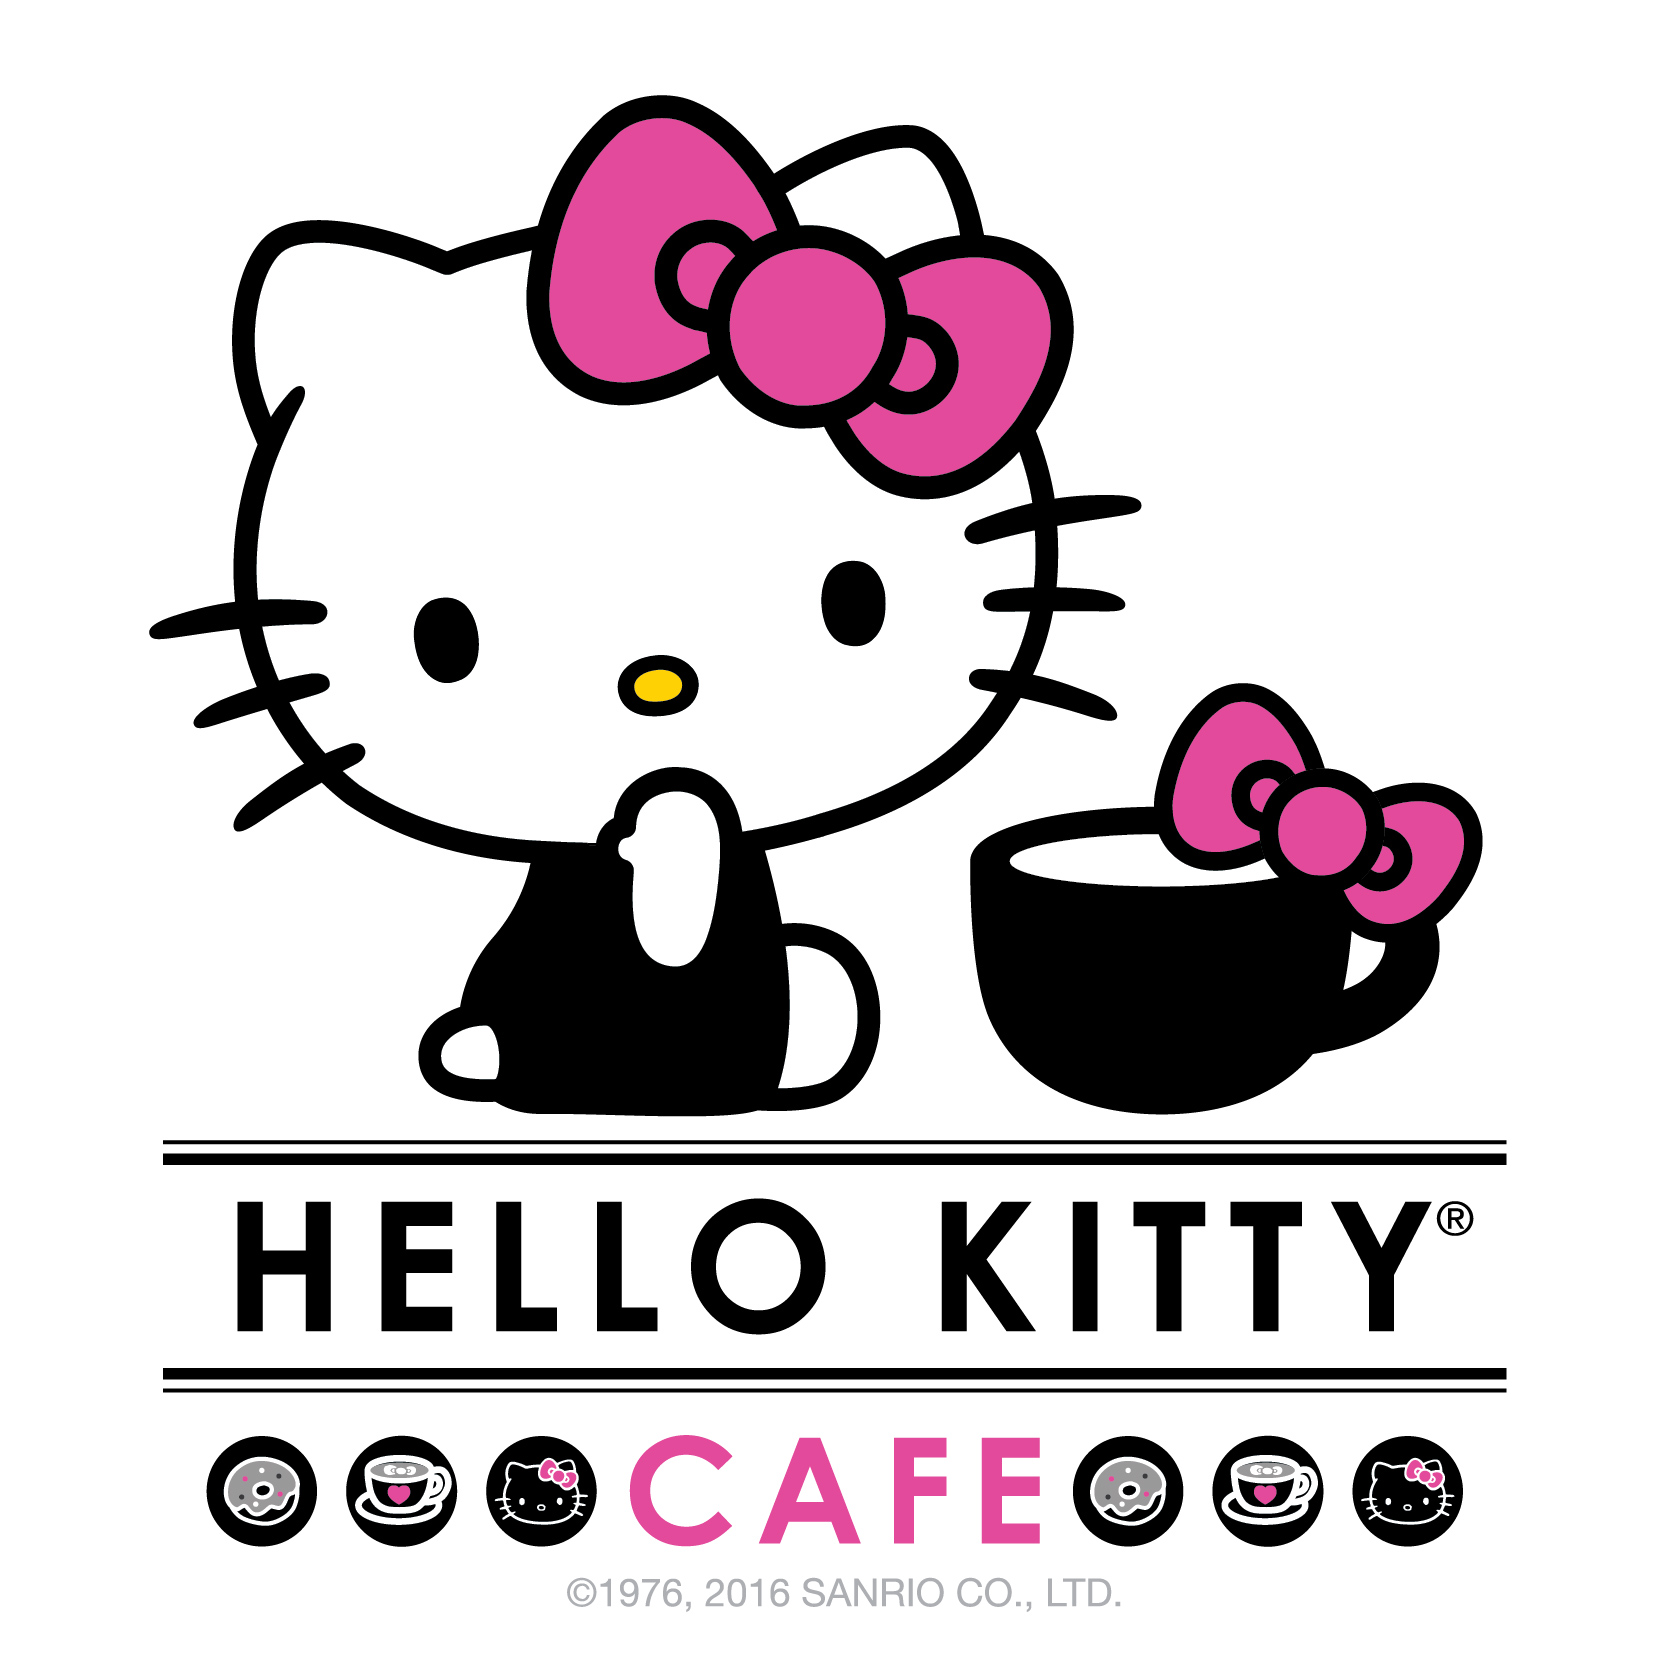 Hello-Kitty-Cafe-Logo-2016.jpg